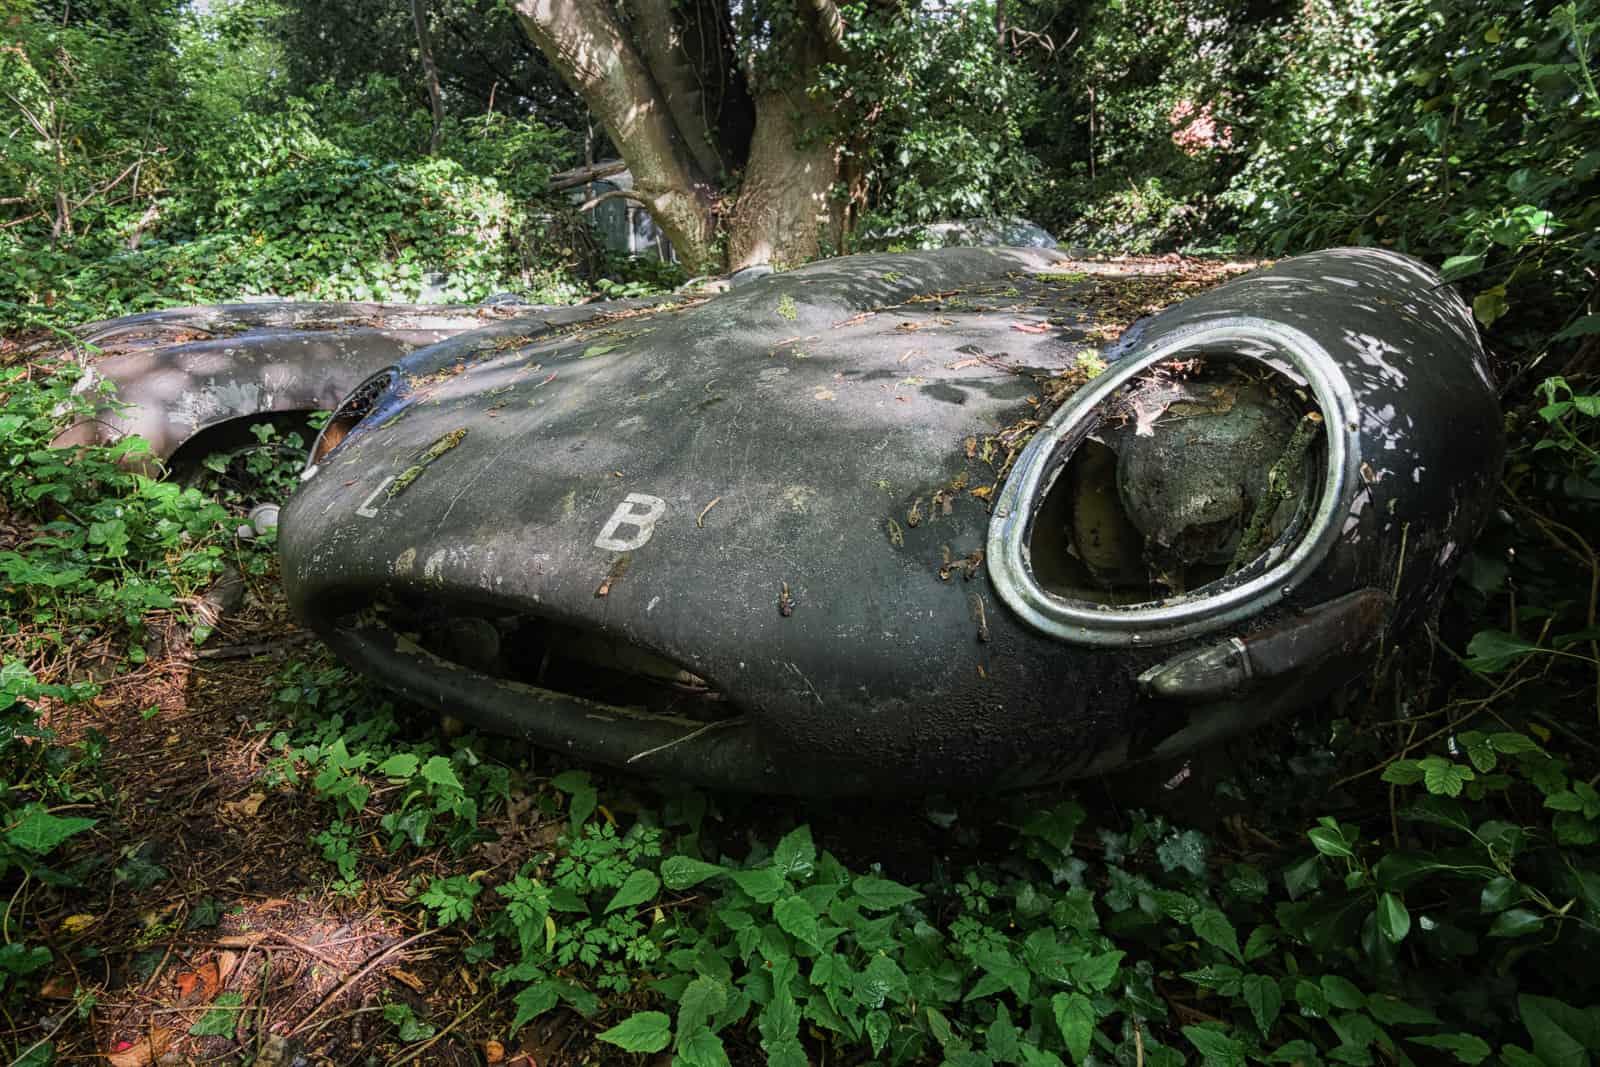 Classic Jaguars, England - Obsidian Urbex Photography | Urban Exploration